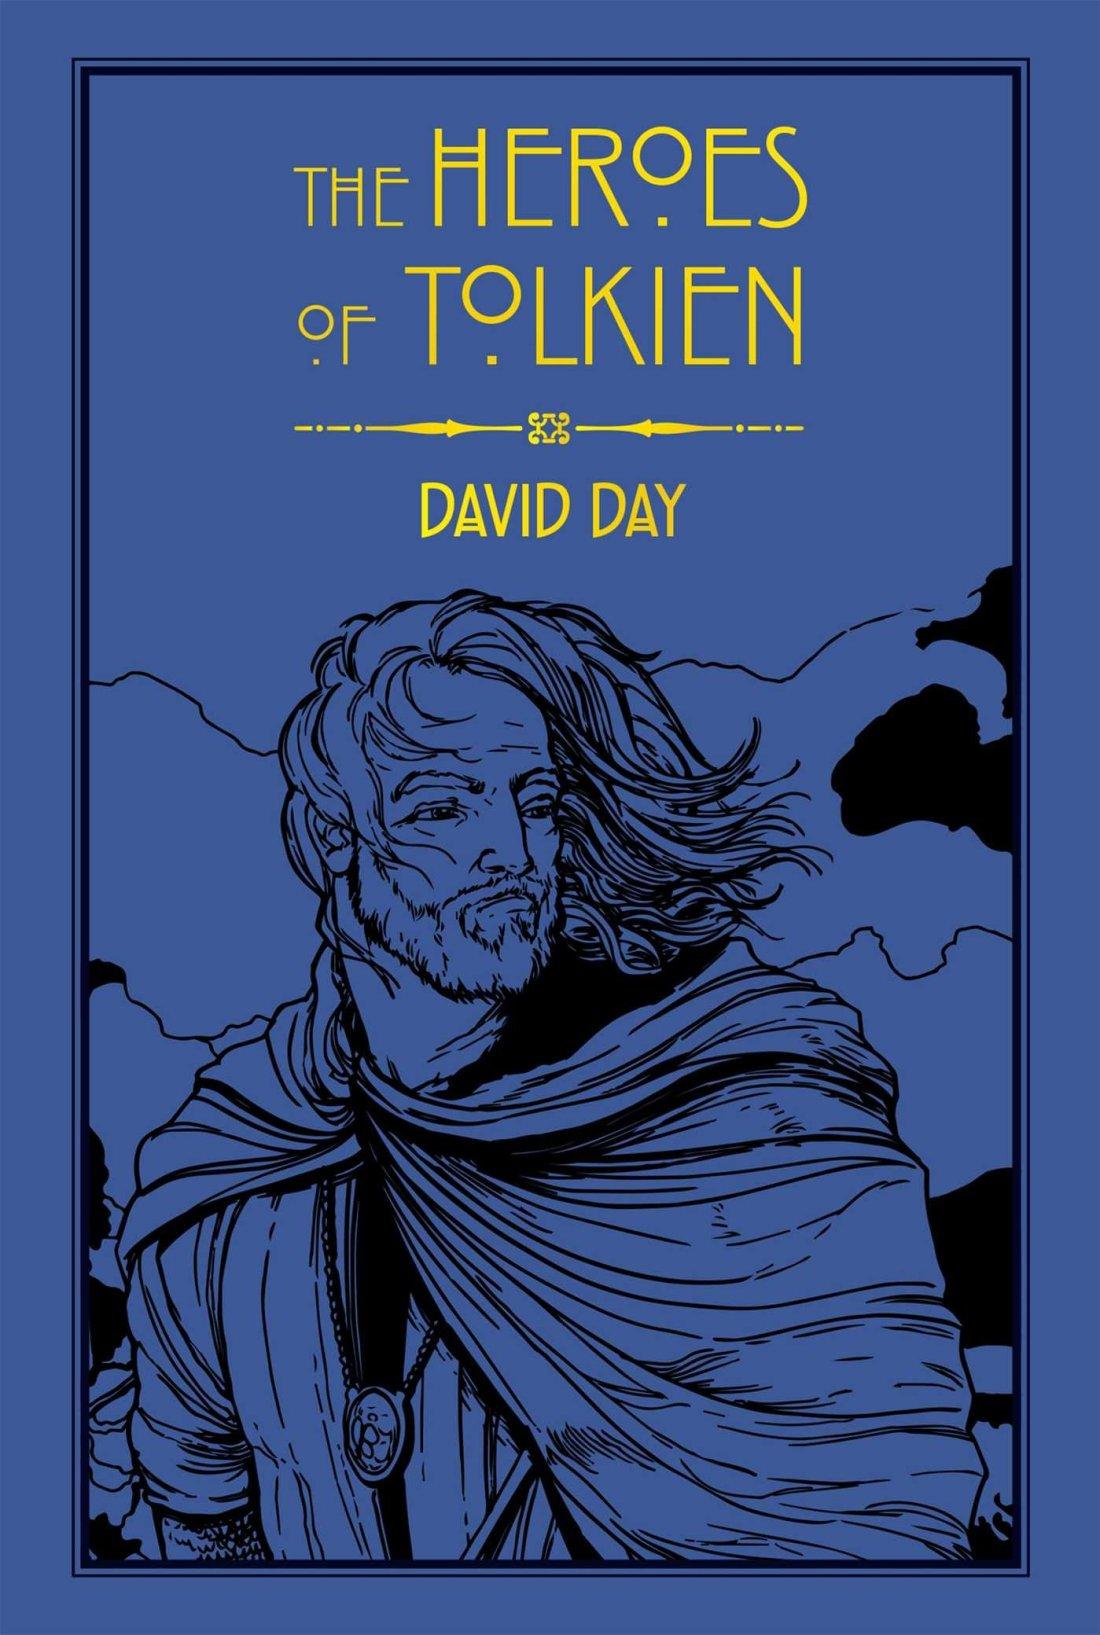 Tolkien image by joseph diate on books a love affair